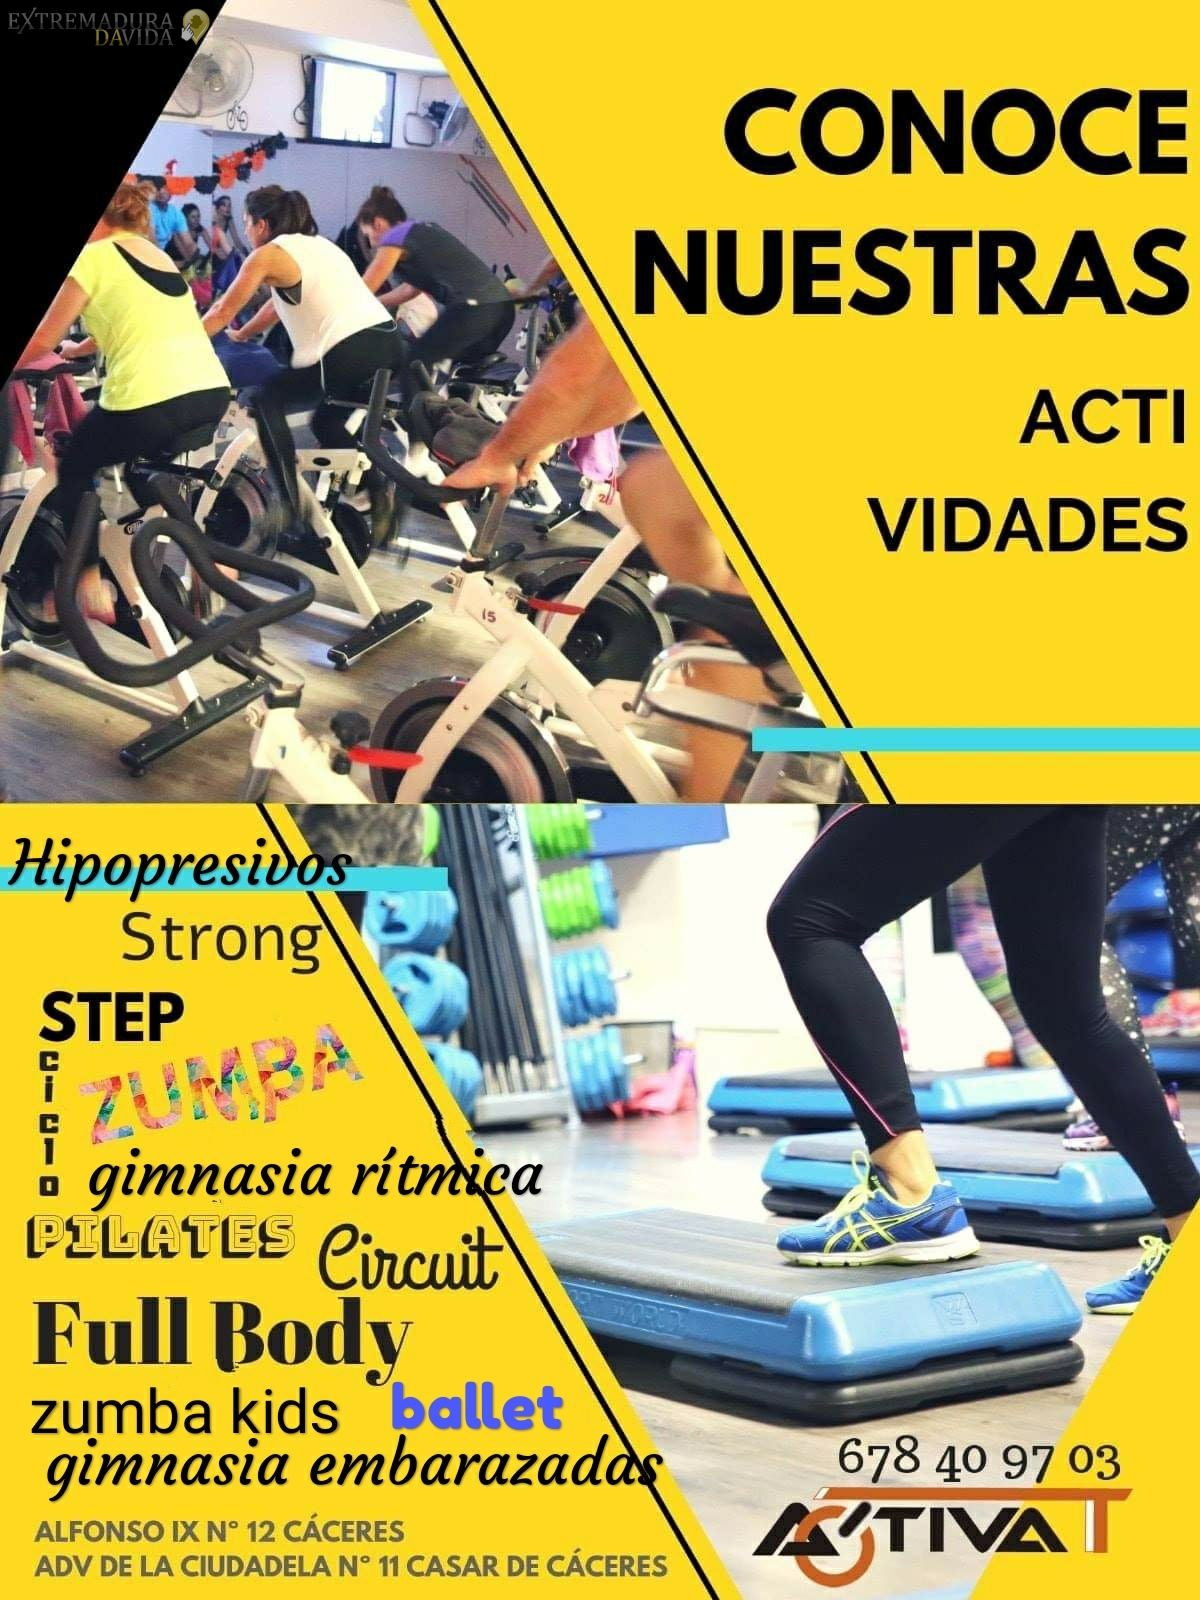 Centro de pilates zumba gym Cáceres Activat